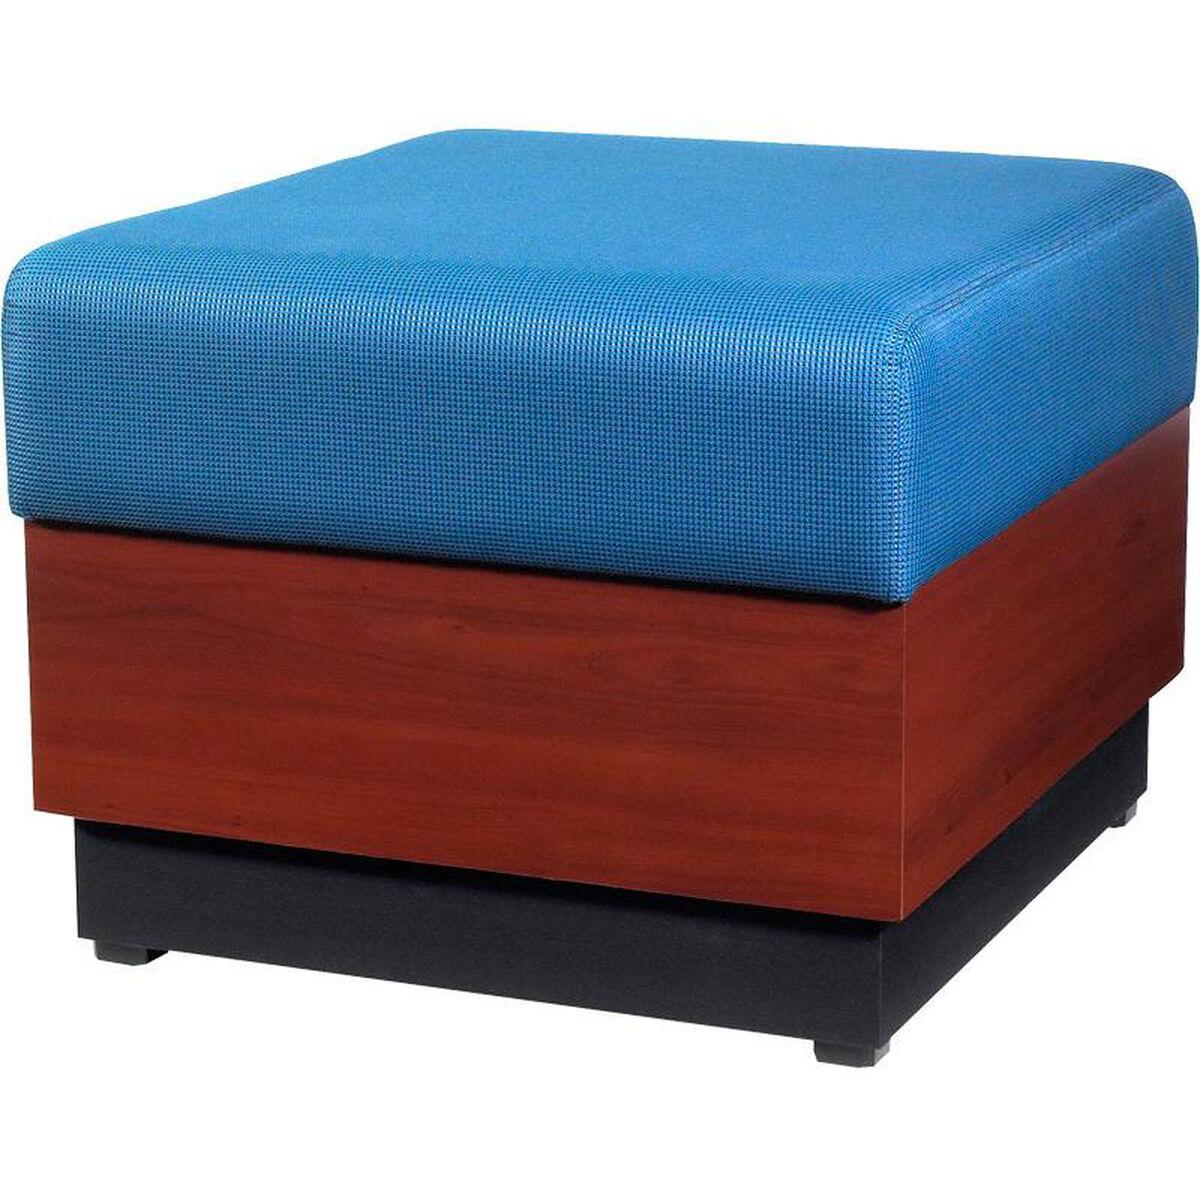 High Point Furniture Industries 7301 Hpf 7301